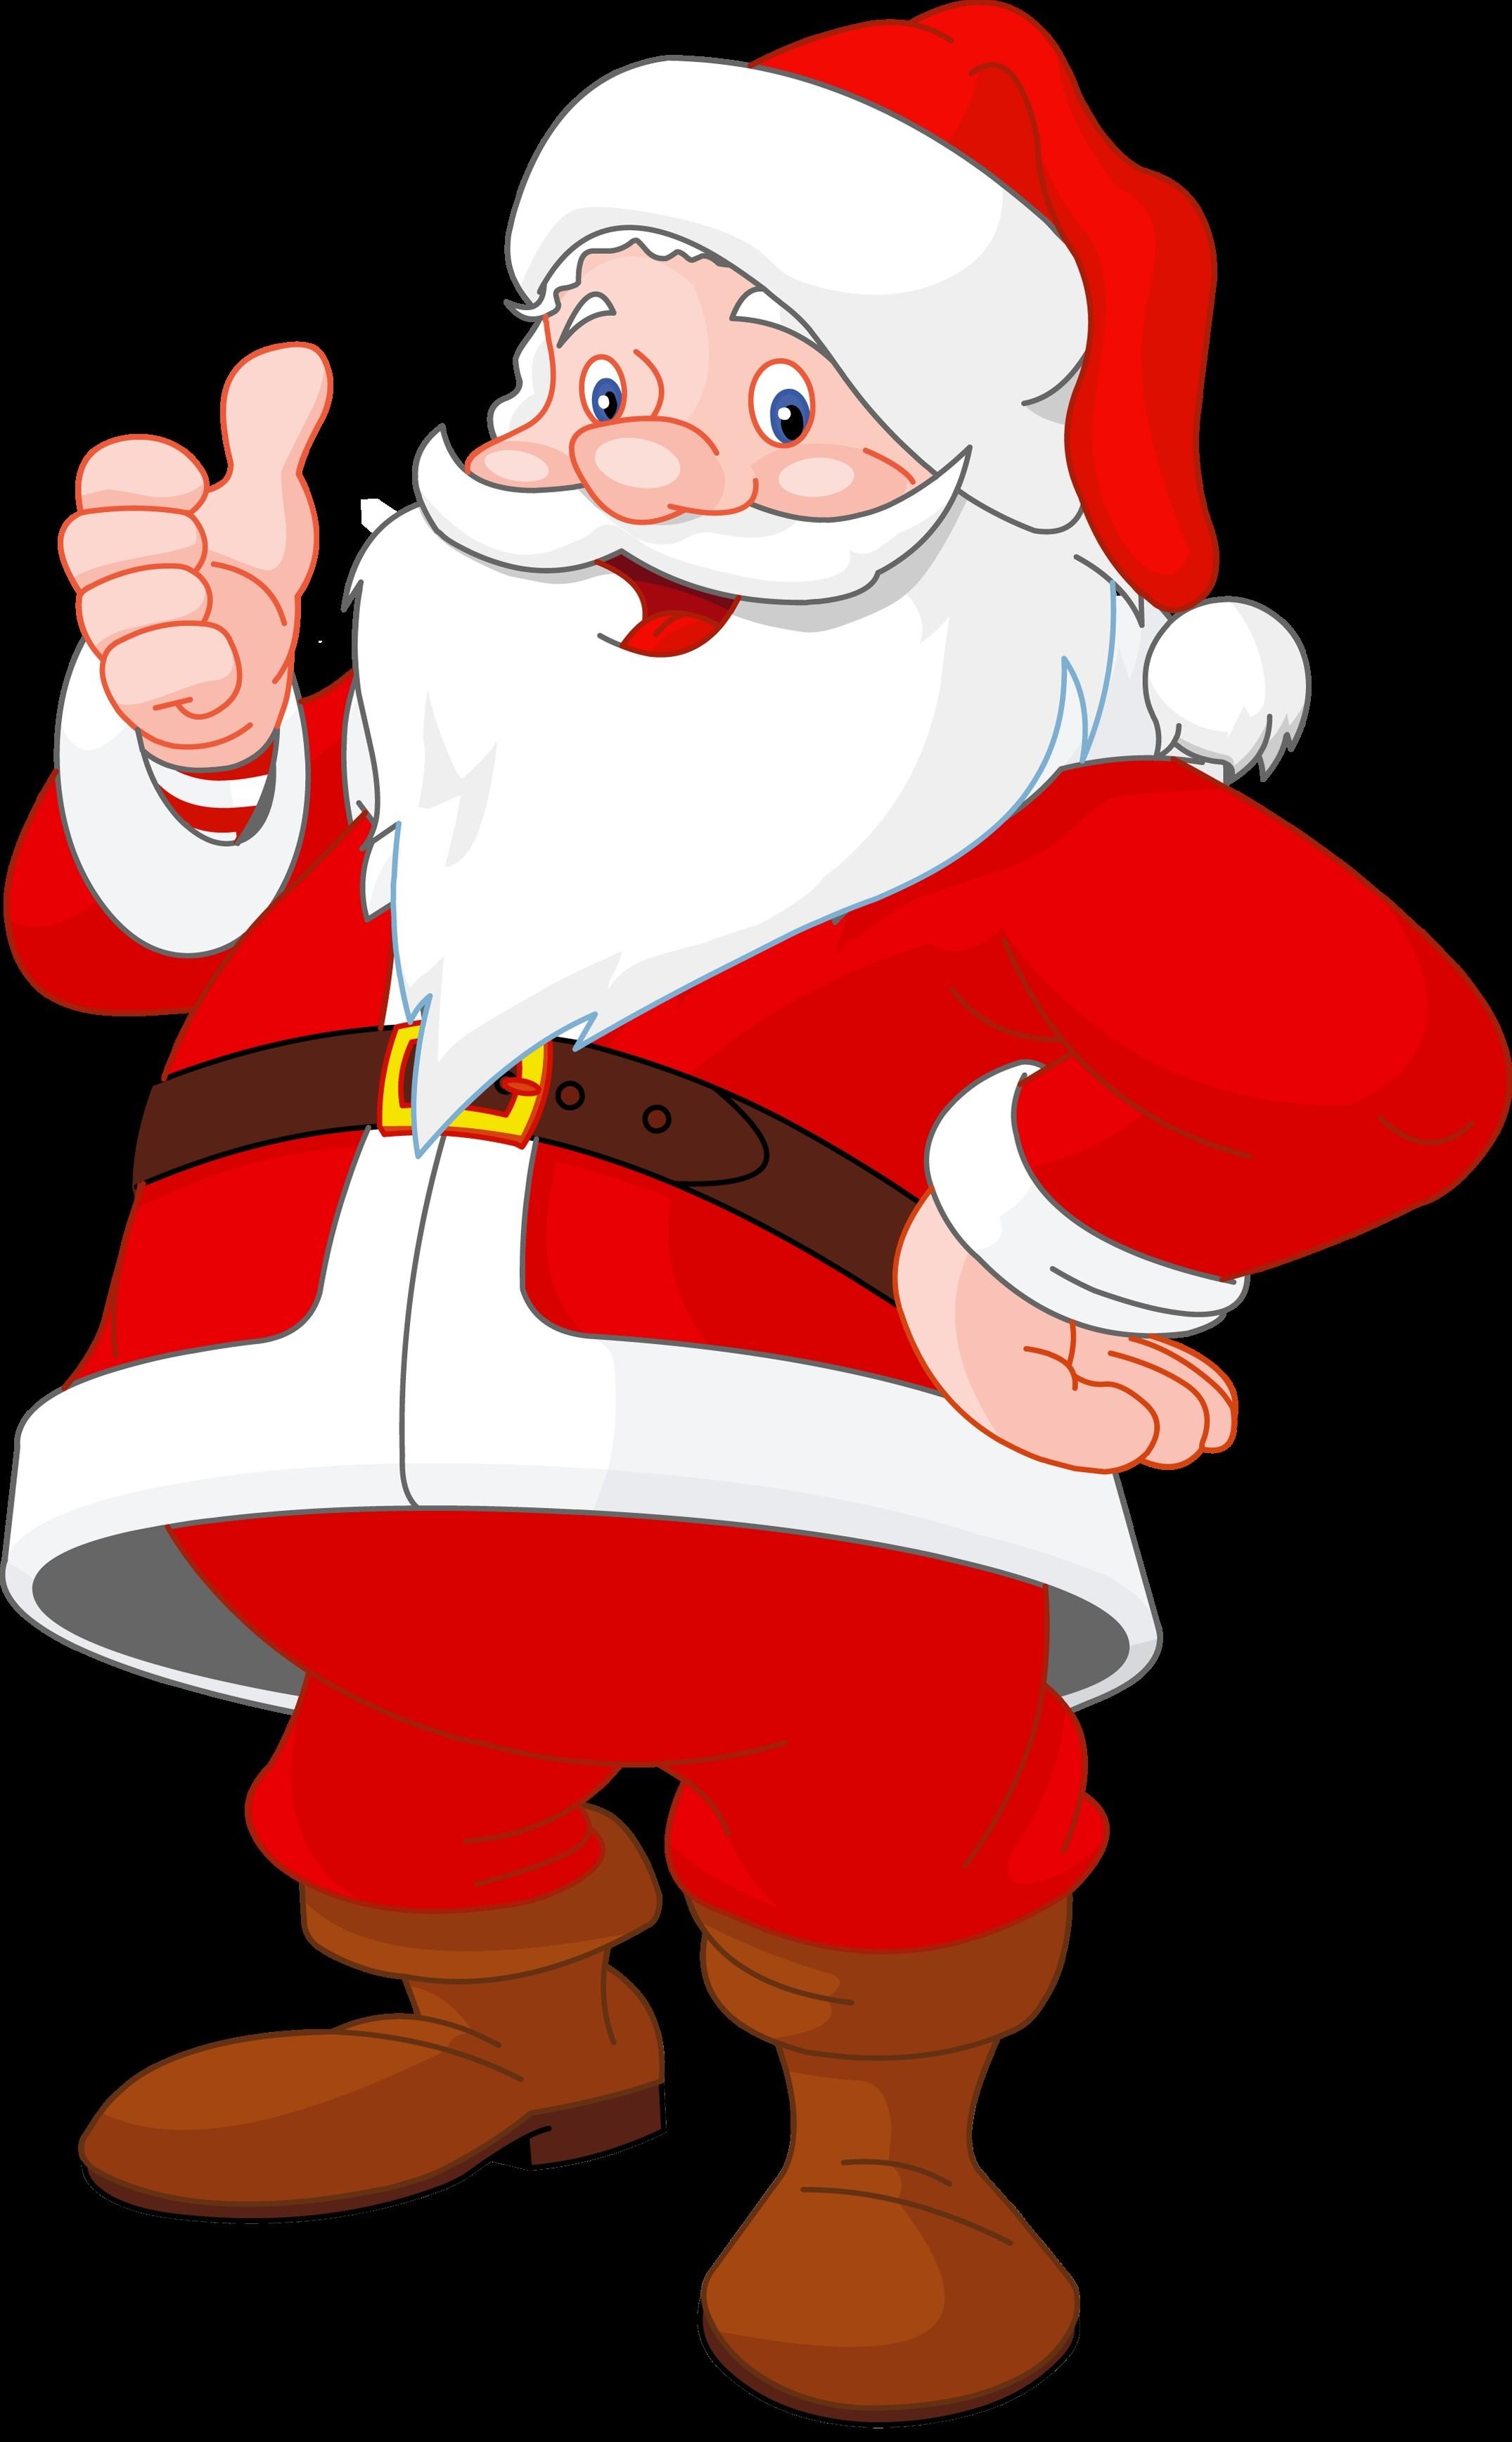 Santa Claus Wallpapers (73+ images)